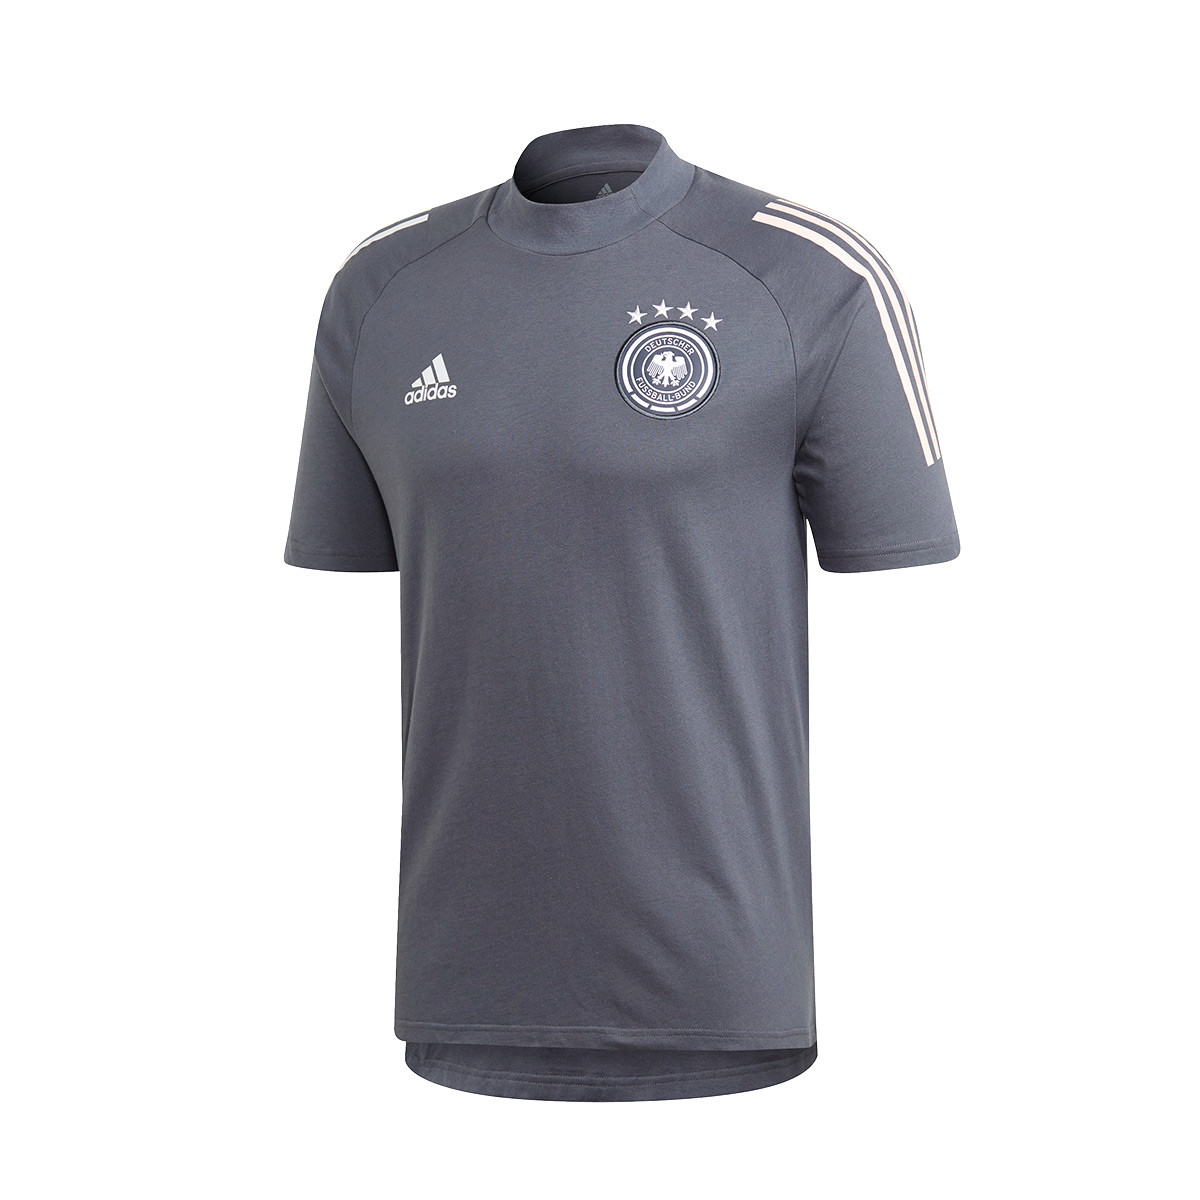 Camisola adidas Alemanha 2019 2020